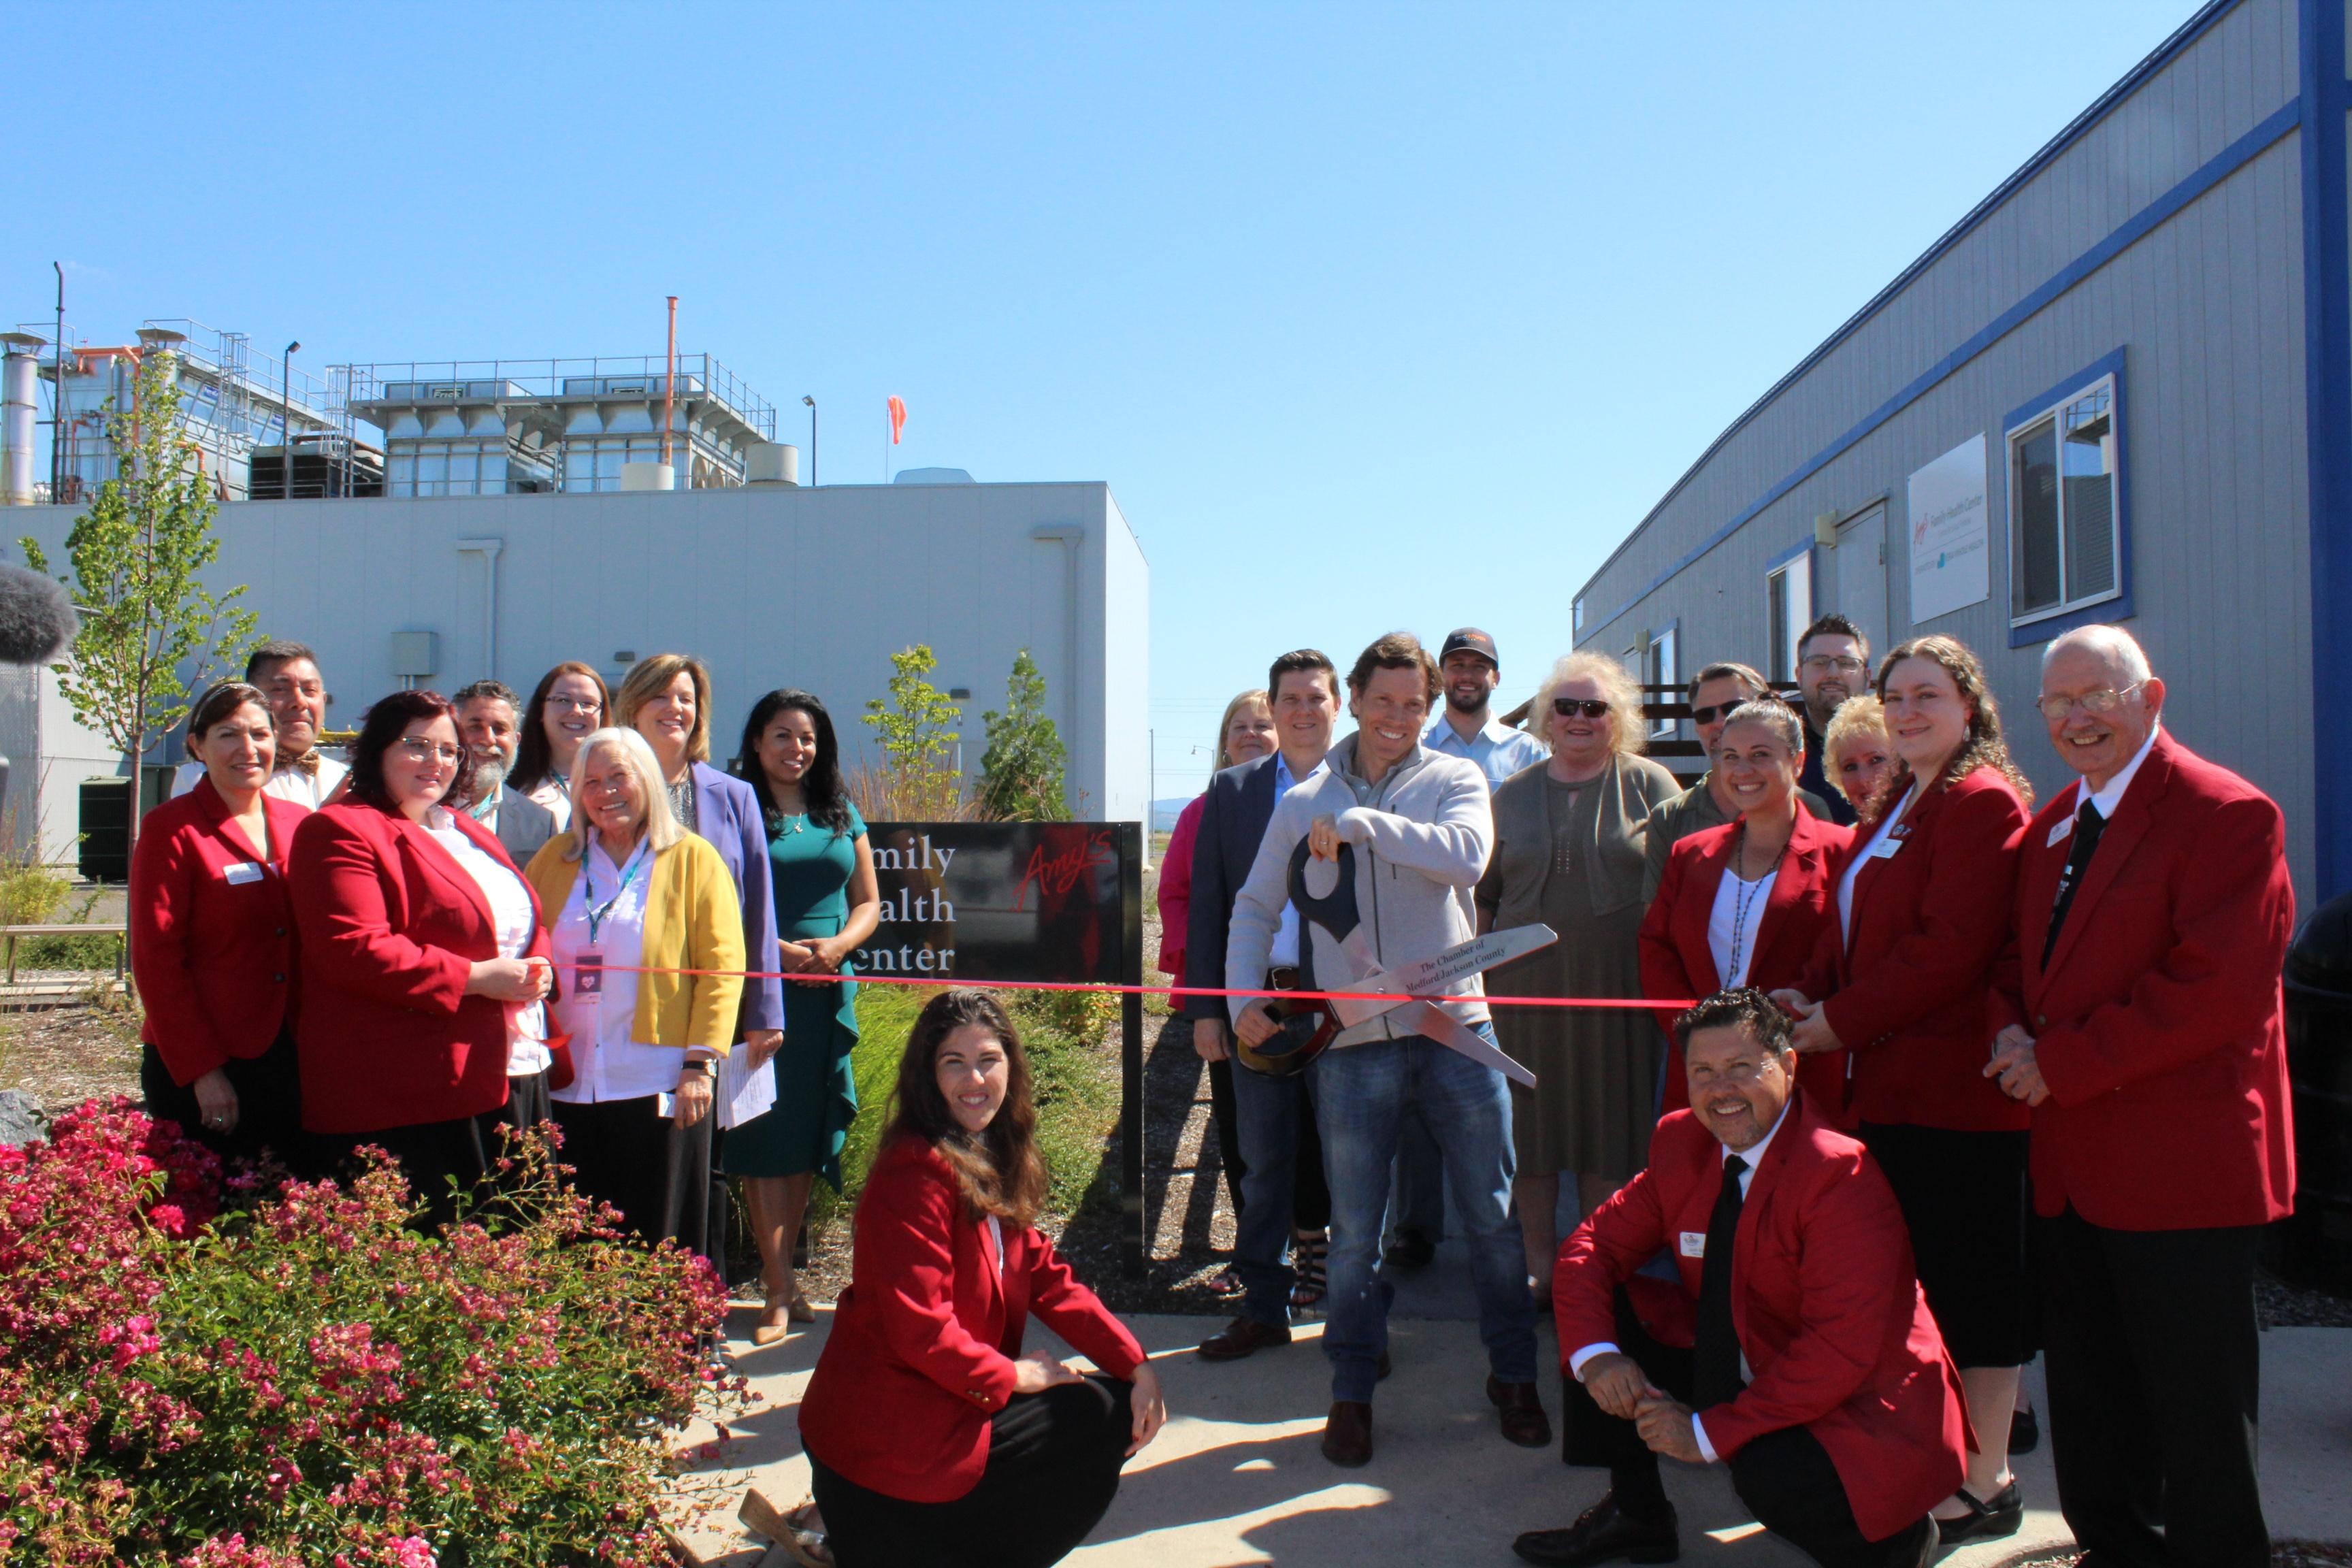 Medford Grand Opening Ribbon Cutting 6.19.18